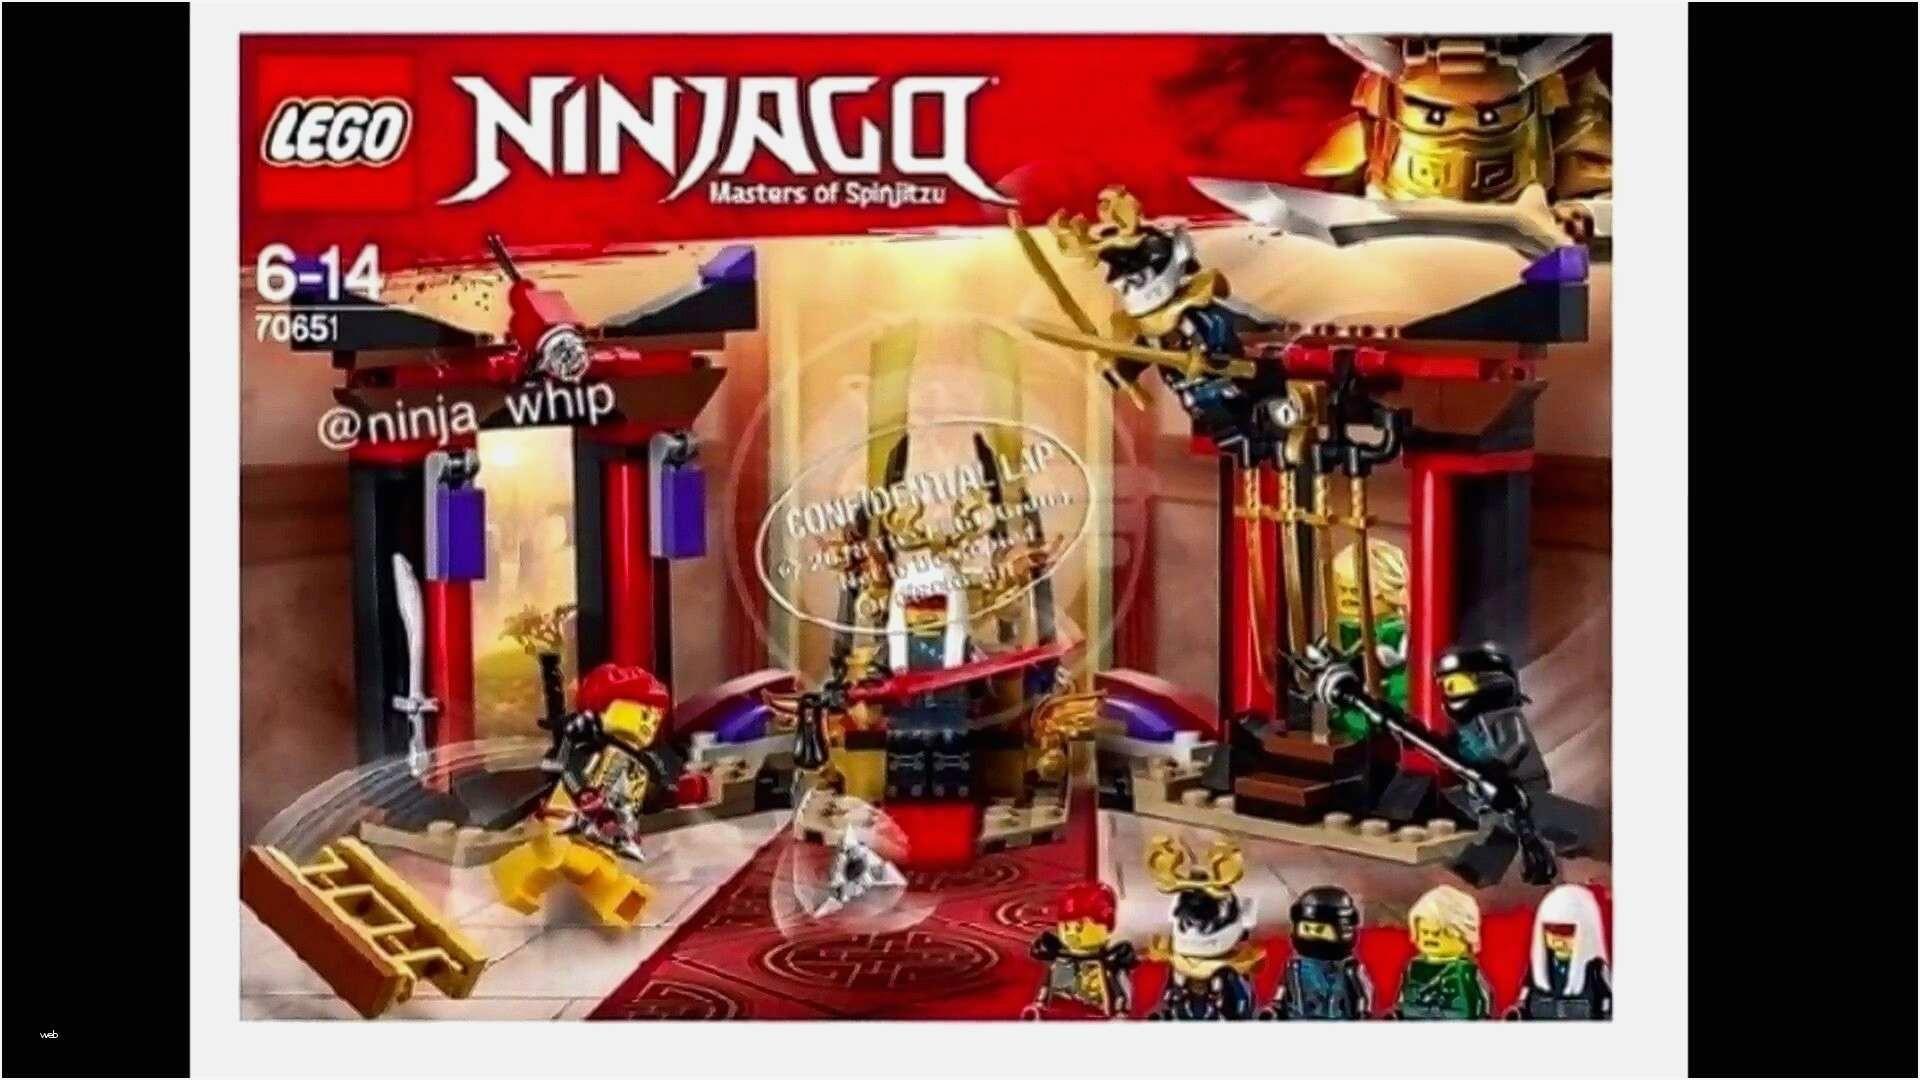 Lego Ninjago Ausmalbilder Neu Lego Ninjago Ausmalbild Beispielbilder Färben Lego Ninjago Birthday Bilder